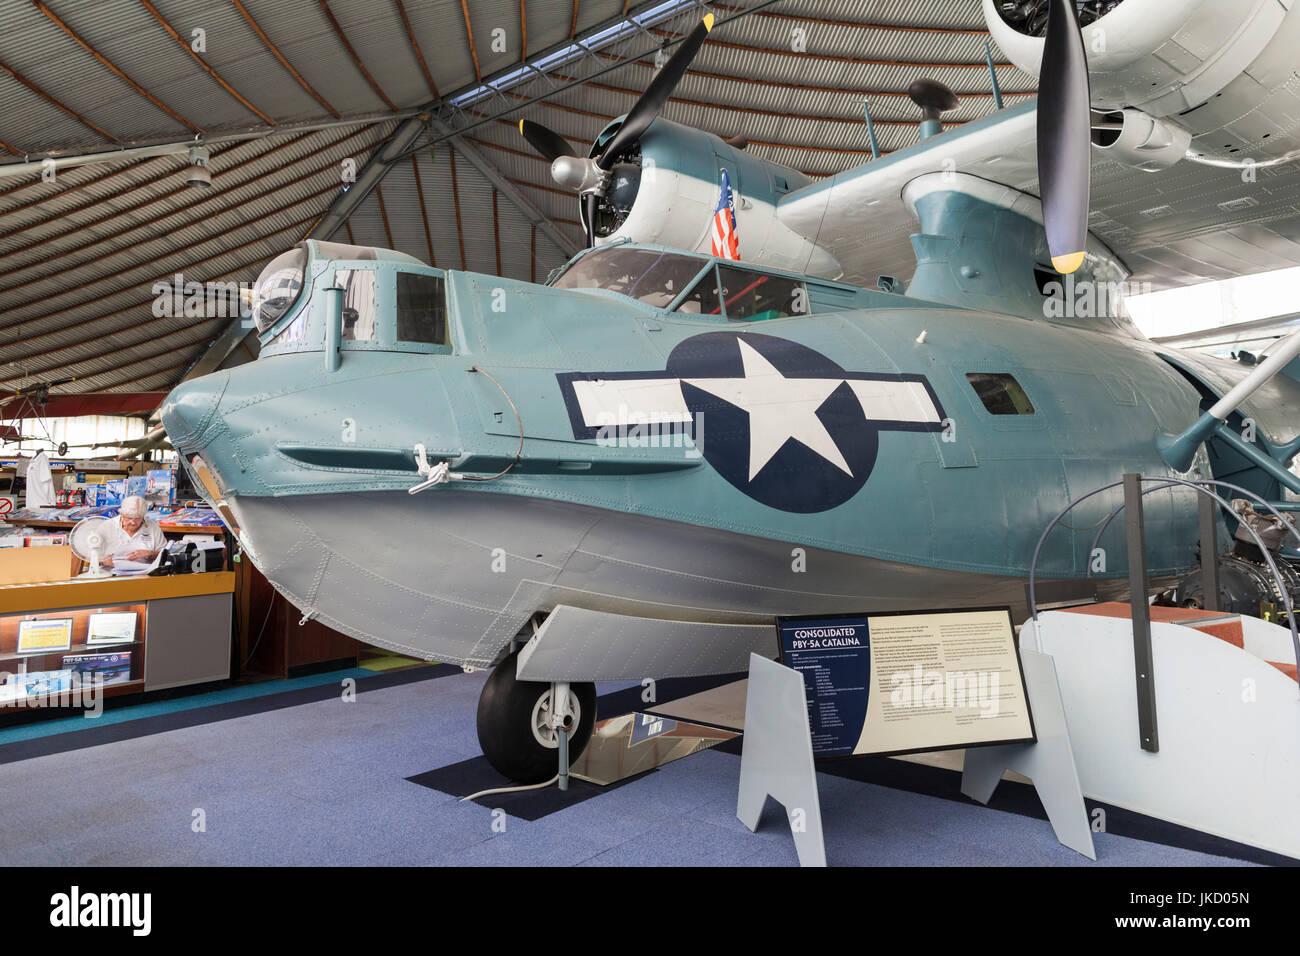 Australia, Western Australia, Bull Creek, RAAF Aviation Heritage Museum, WW2-era PBY Catalina seaplane - Stock Image